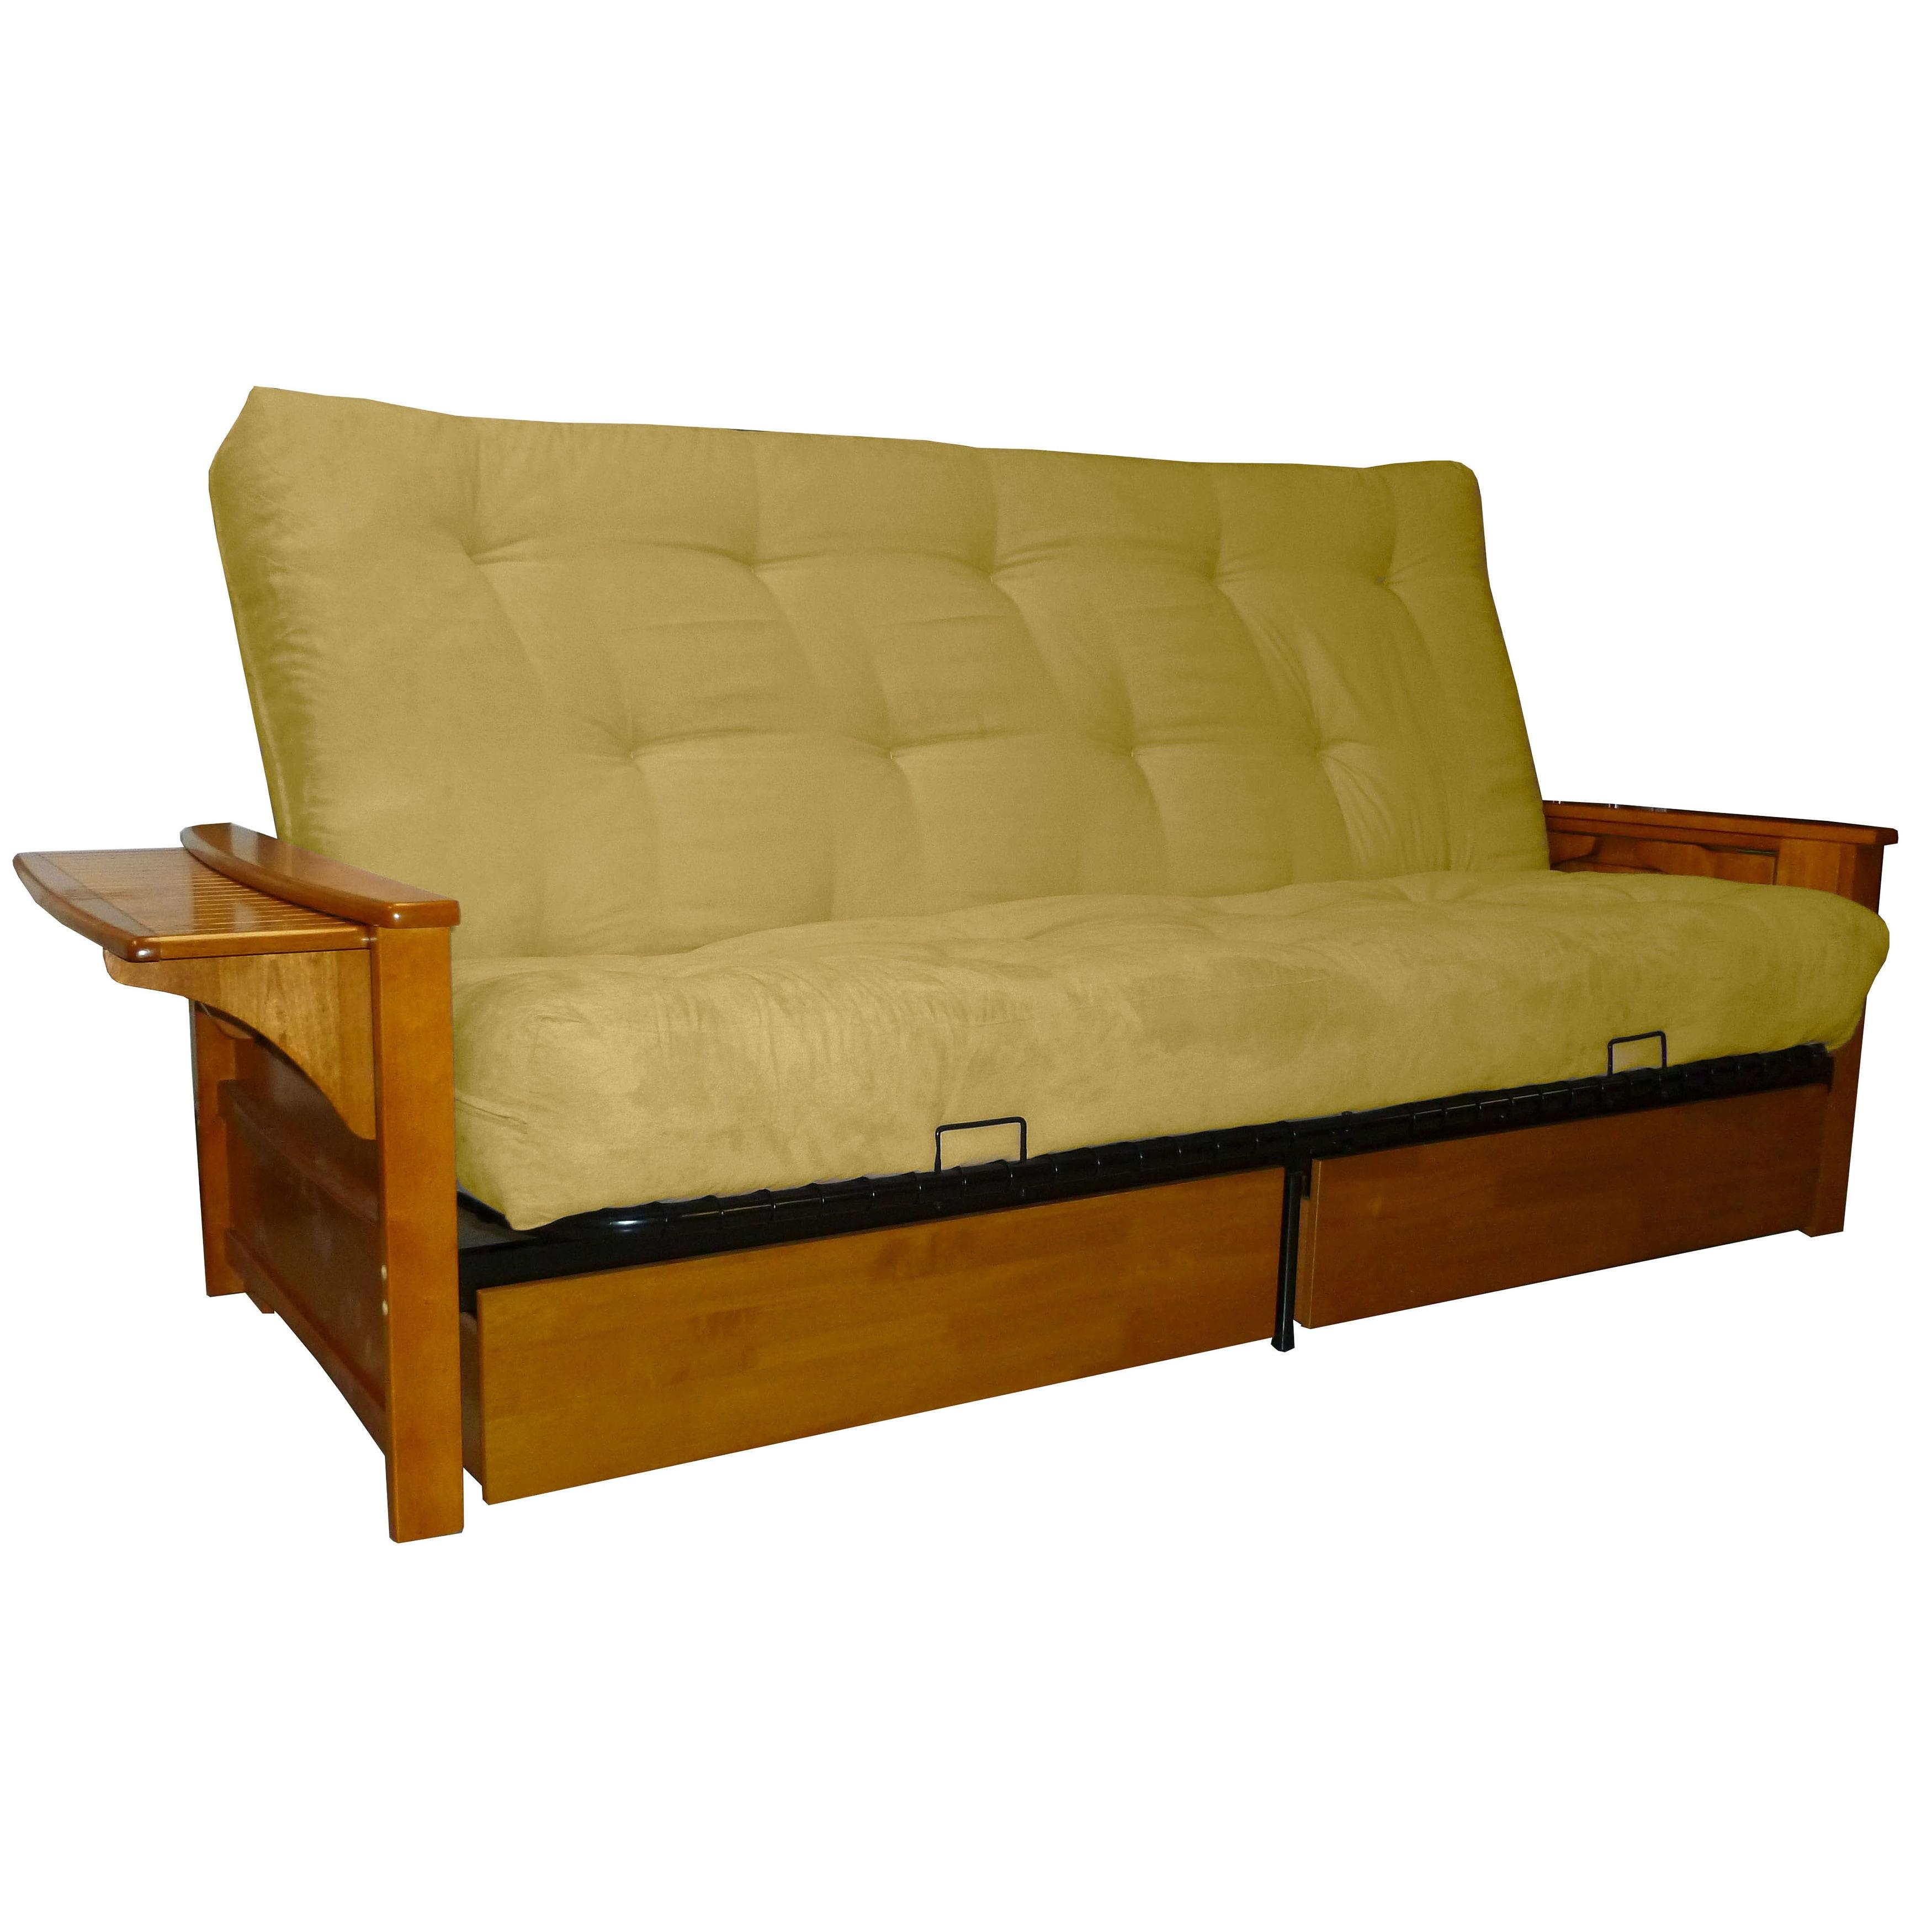 products mixed on futon filling comfortable to bottom shikifuton single color mixedfilling sleep shiki mattress futons